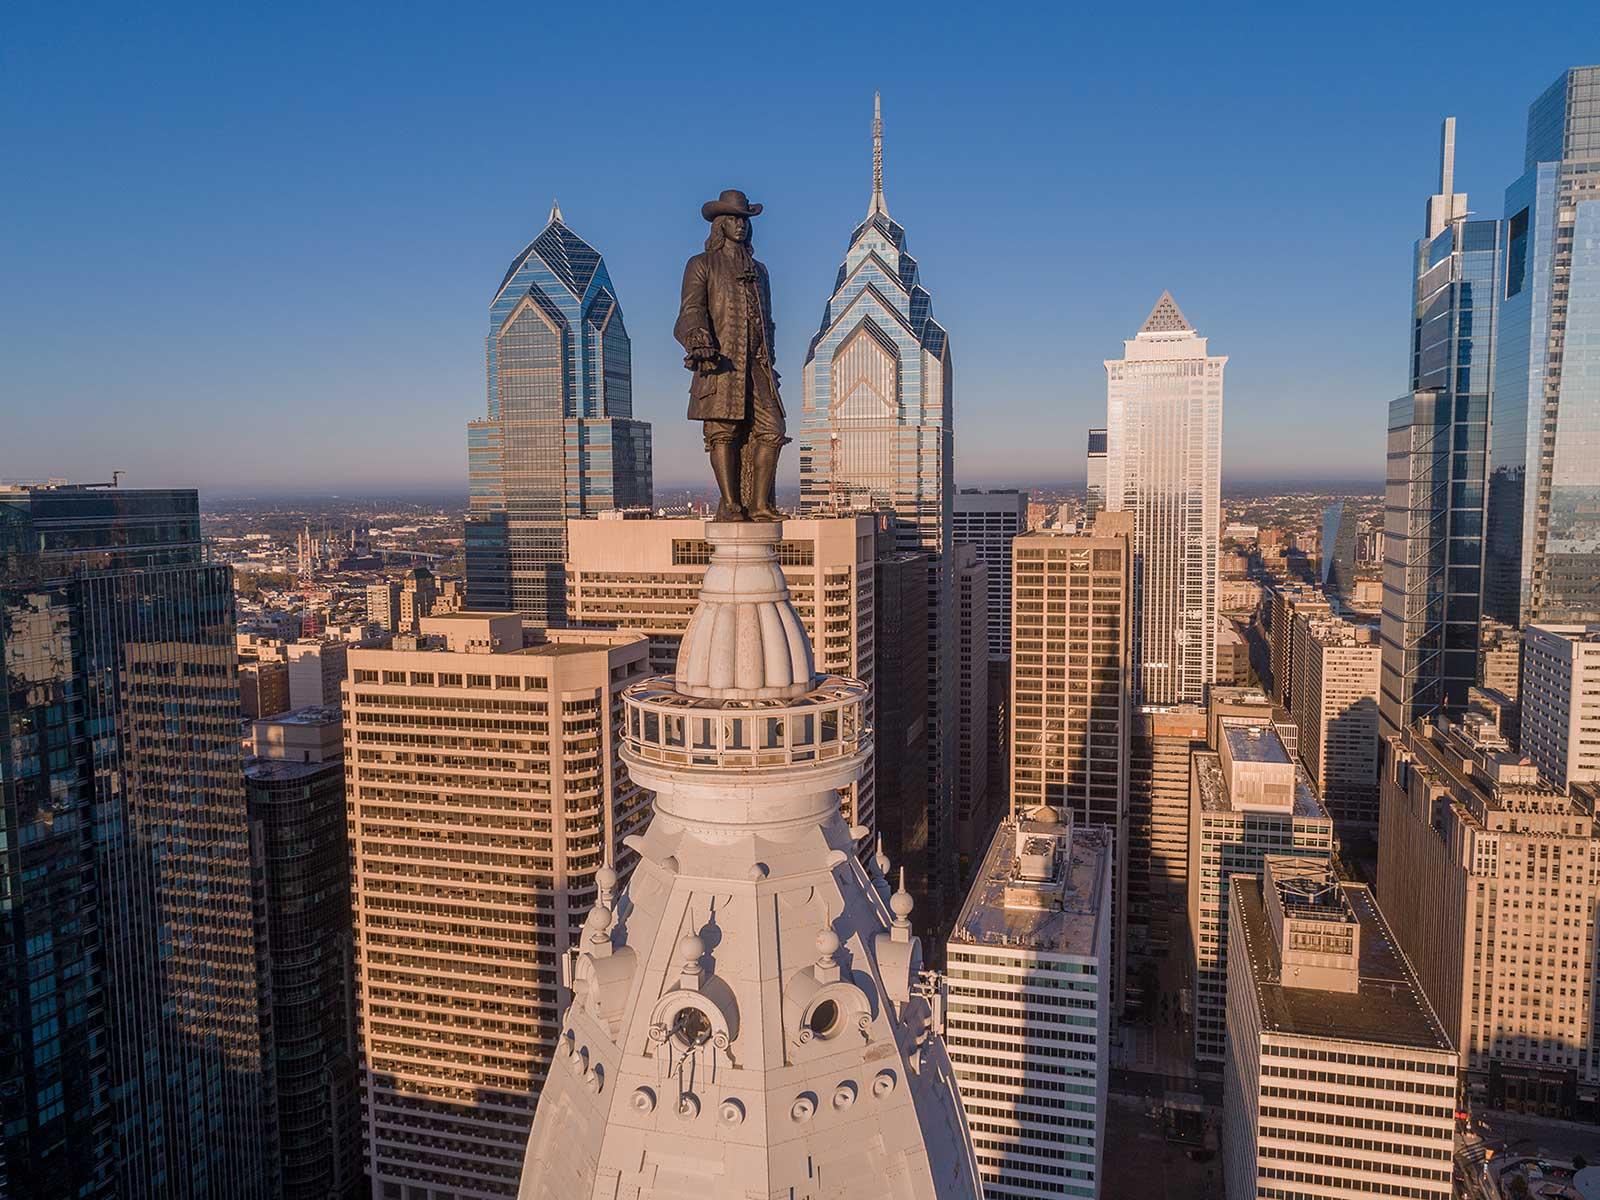 Law Firm, Center City, Philadelphia